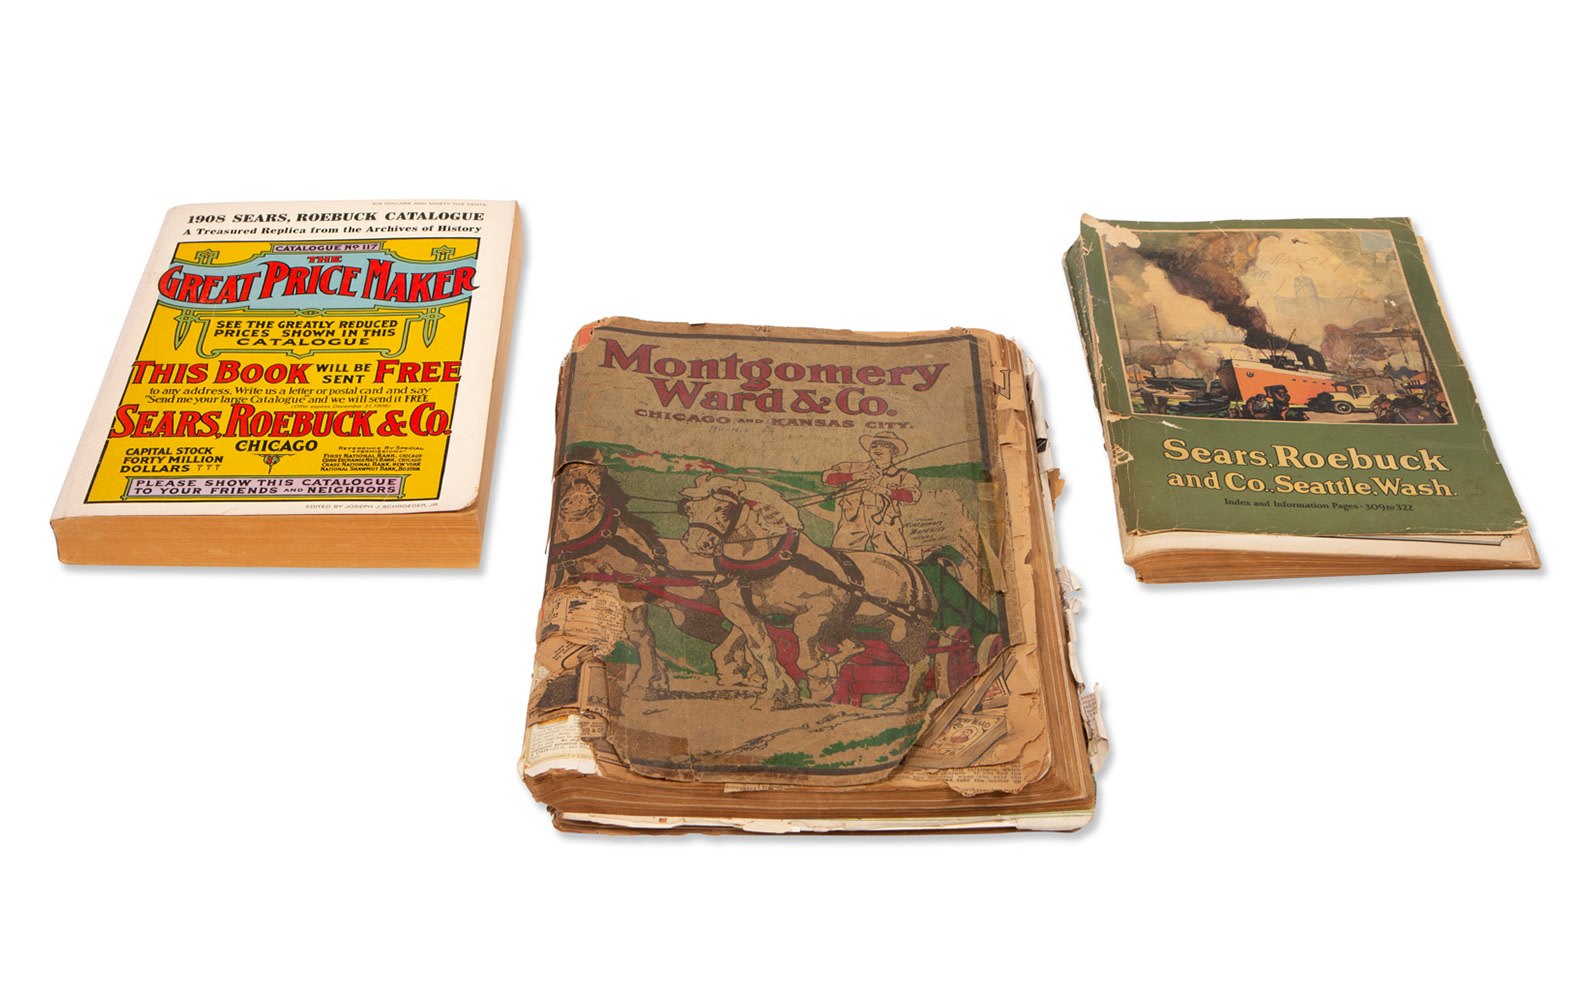 Montgomery Ward & Co. and Sears Roebuck & Company Catalogues, c. 1912–1924